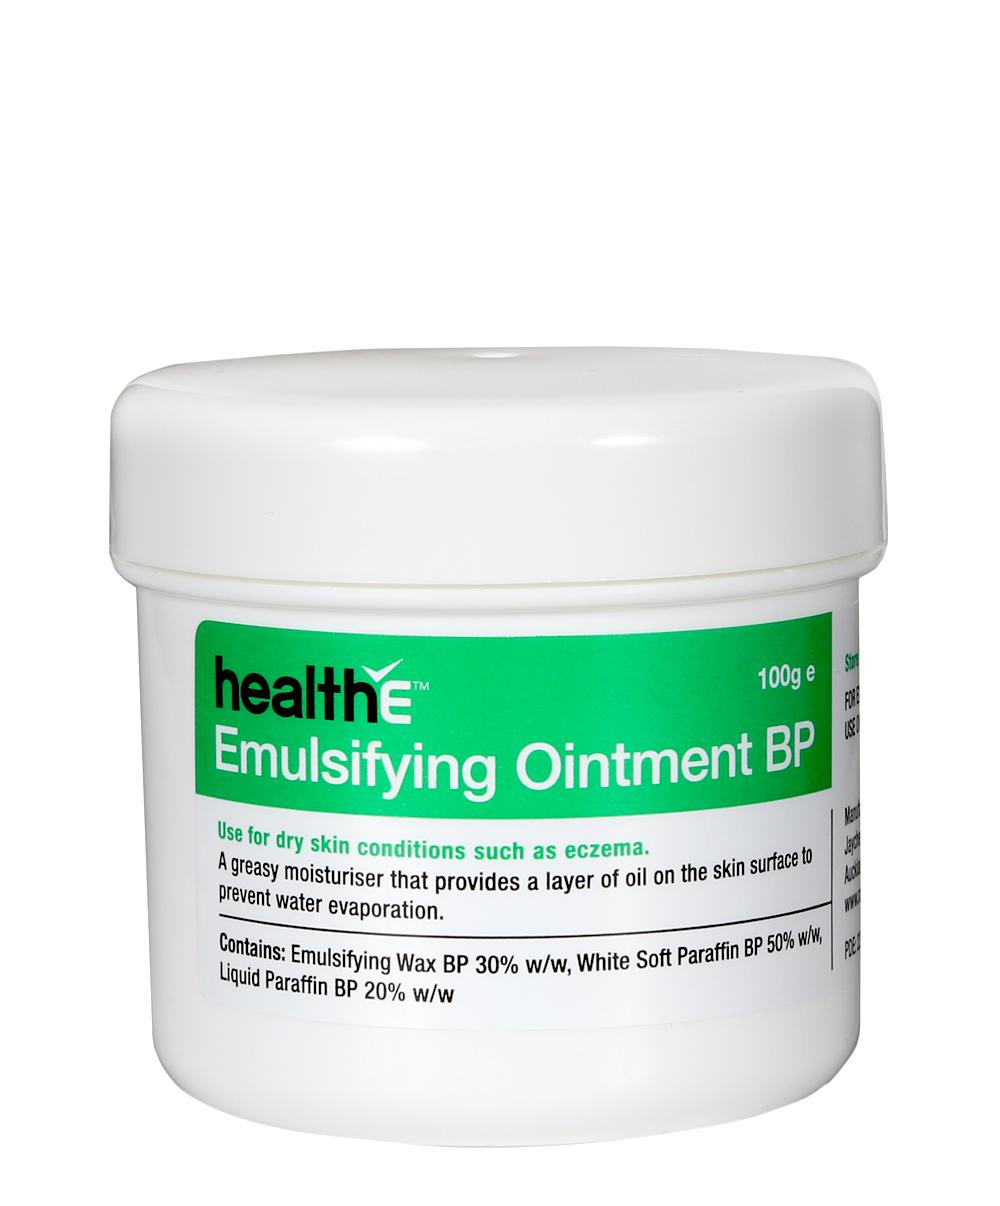 Emulsifying Ointment BP, 100g — HealthE